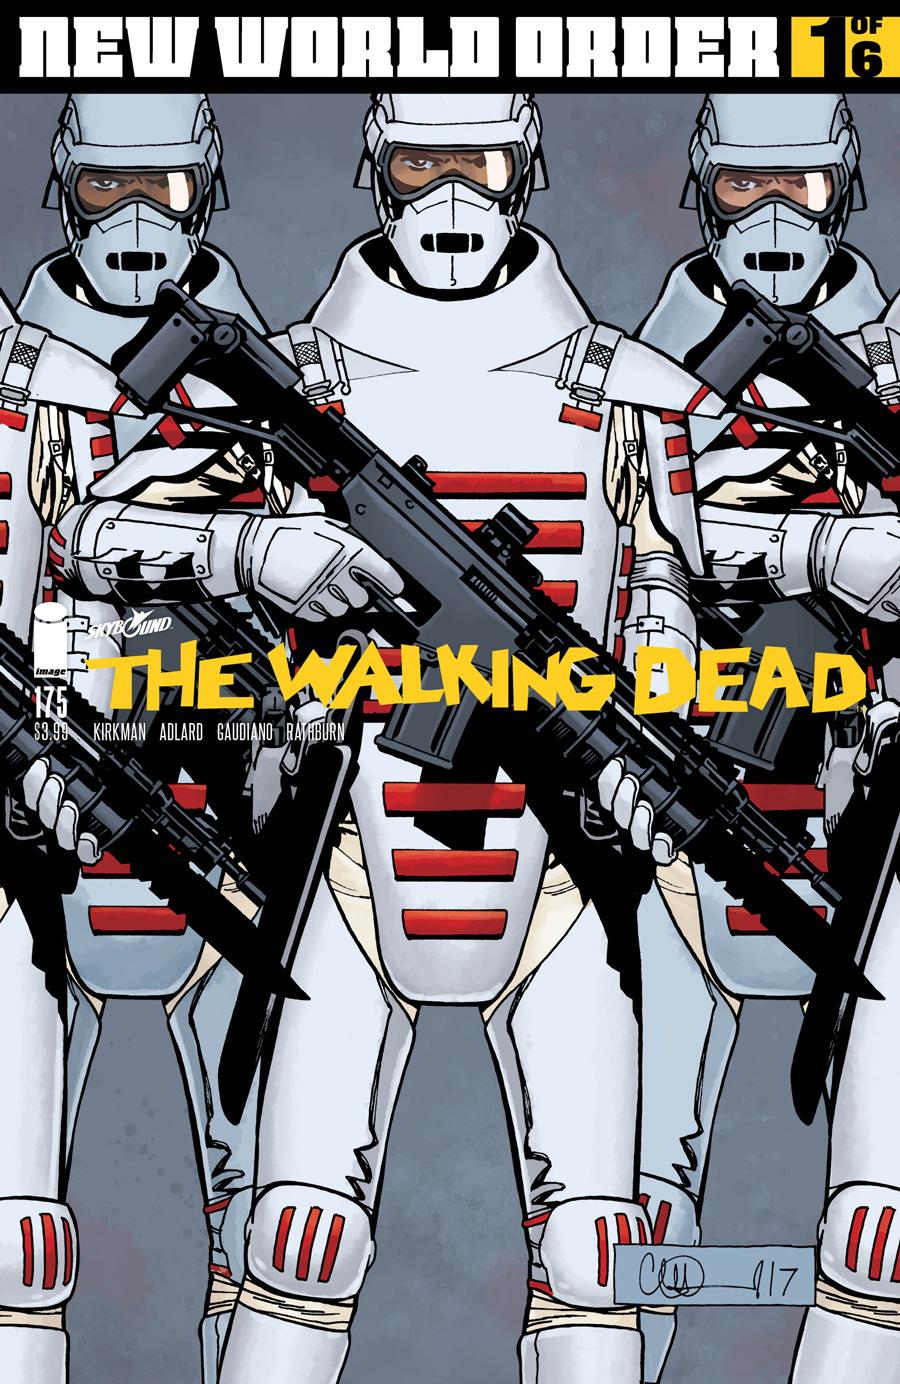 thewalkingdead-175-cover